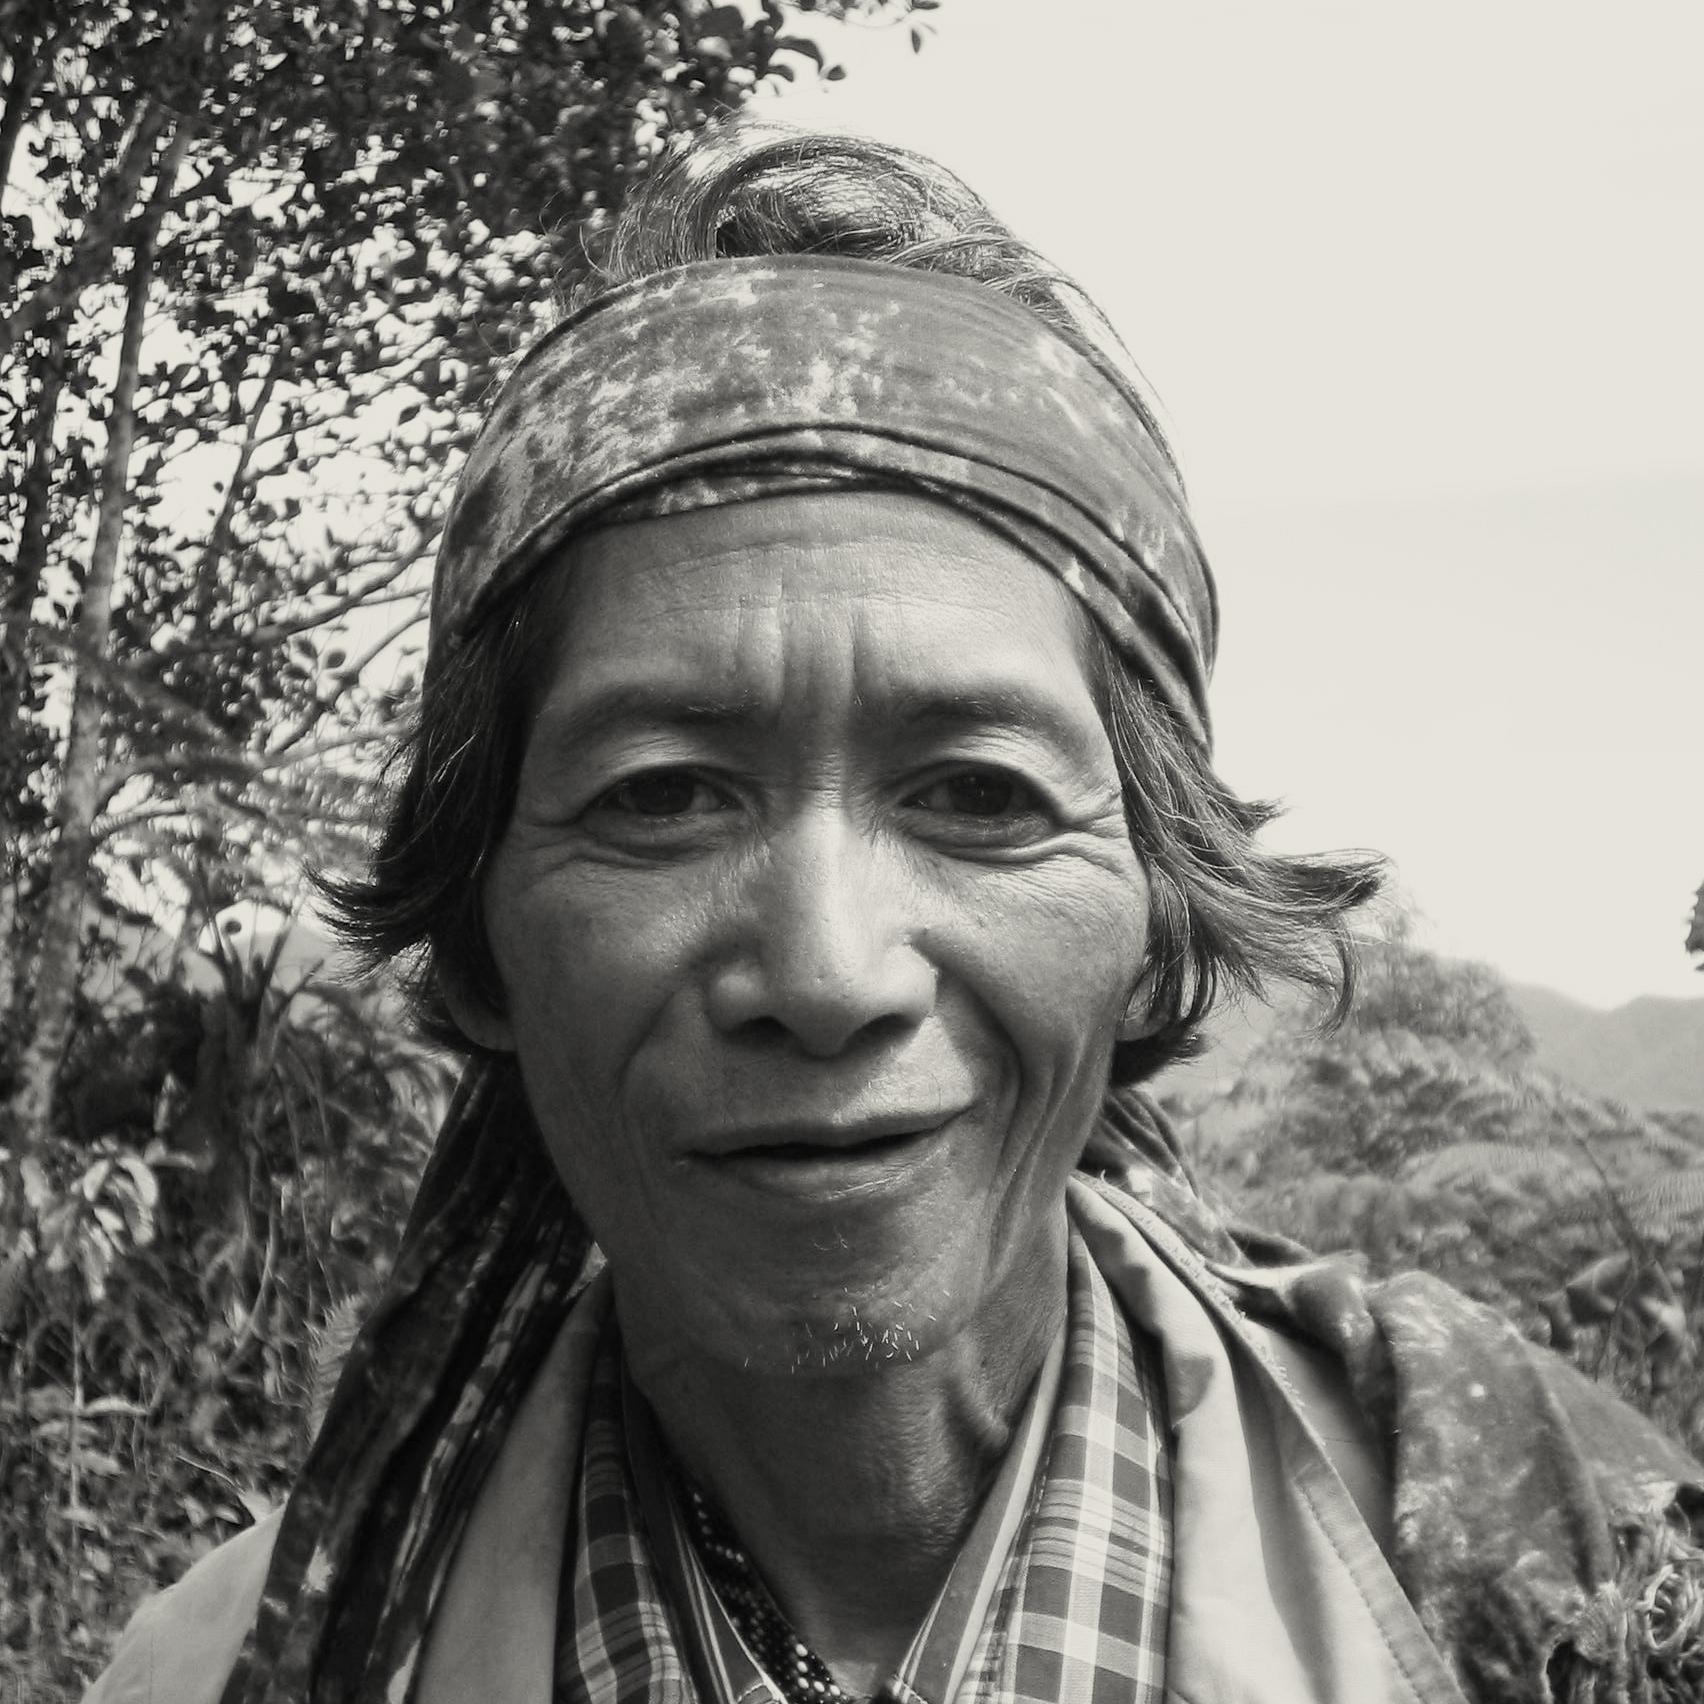 Amay in Mintapod village, Bukidnon province, Mindanao Island (Photo: Arian M. Santos, 2005).